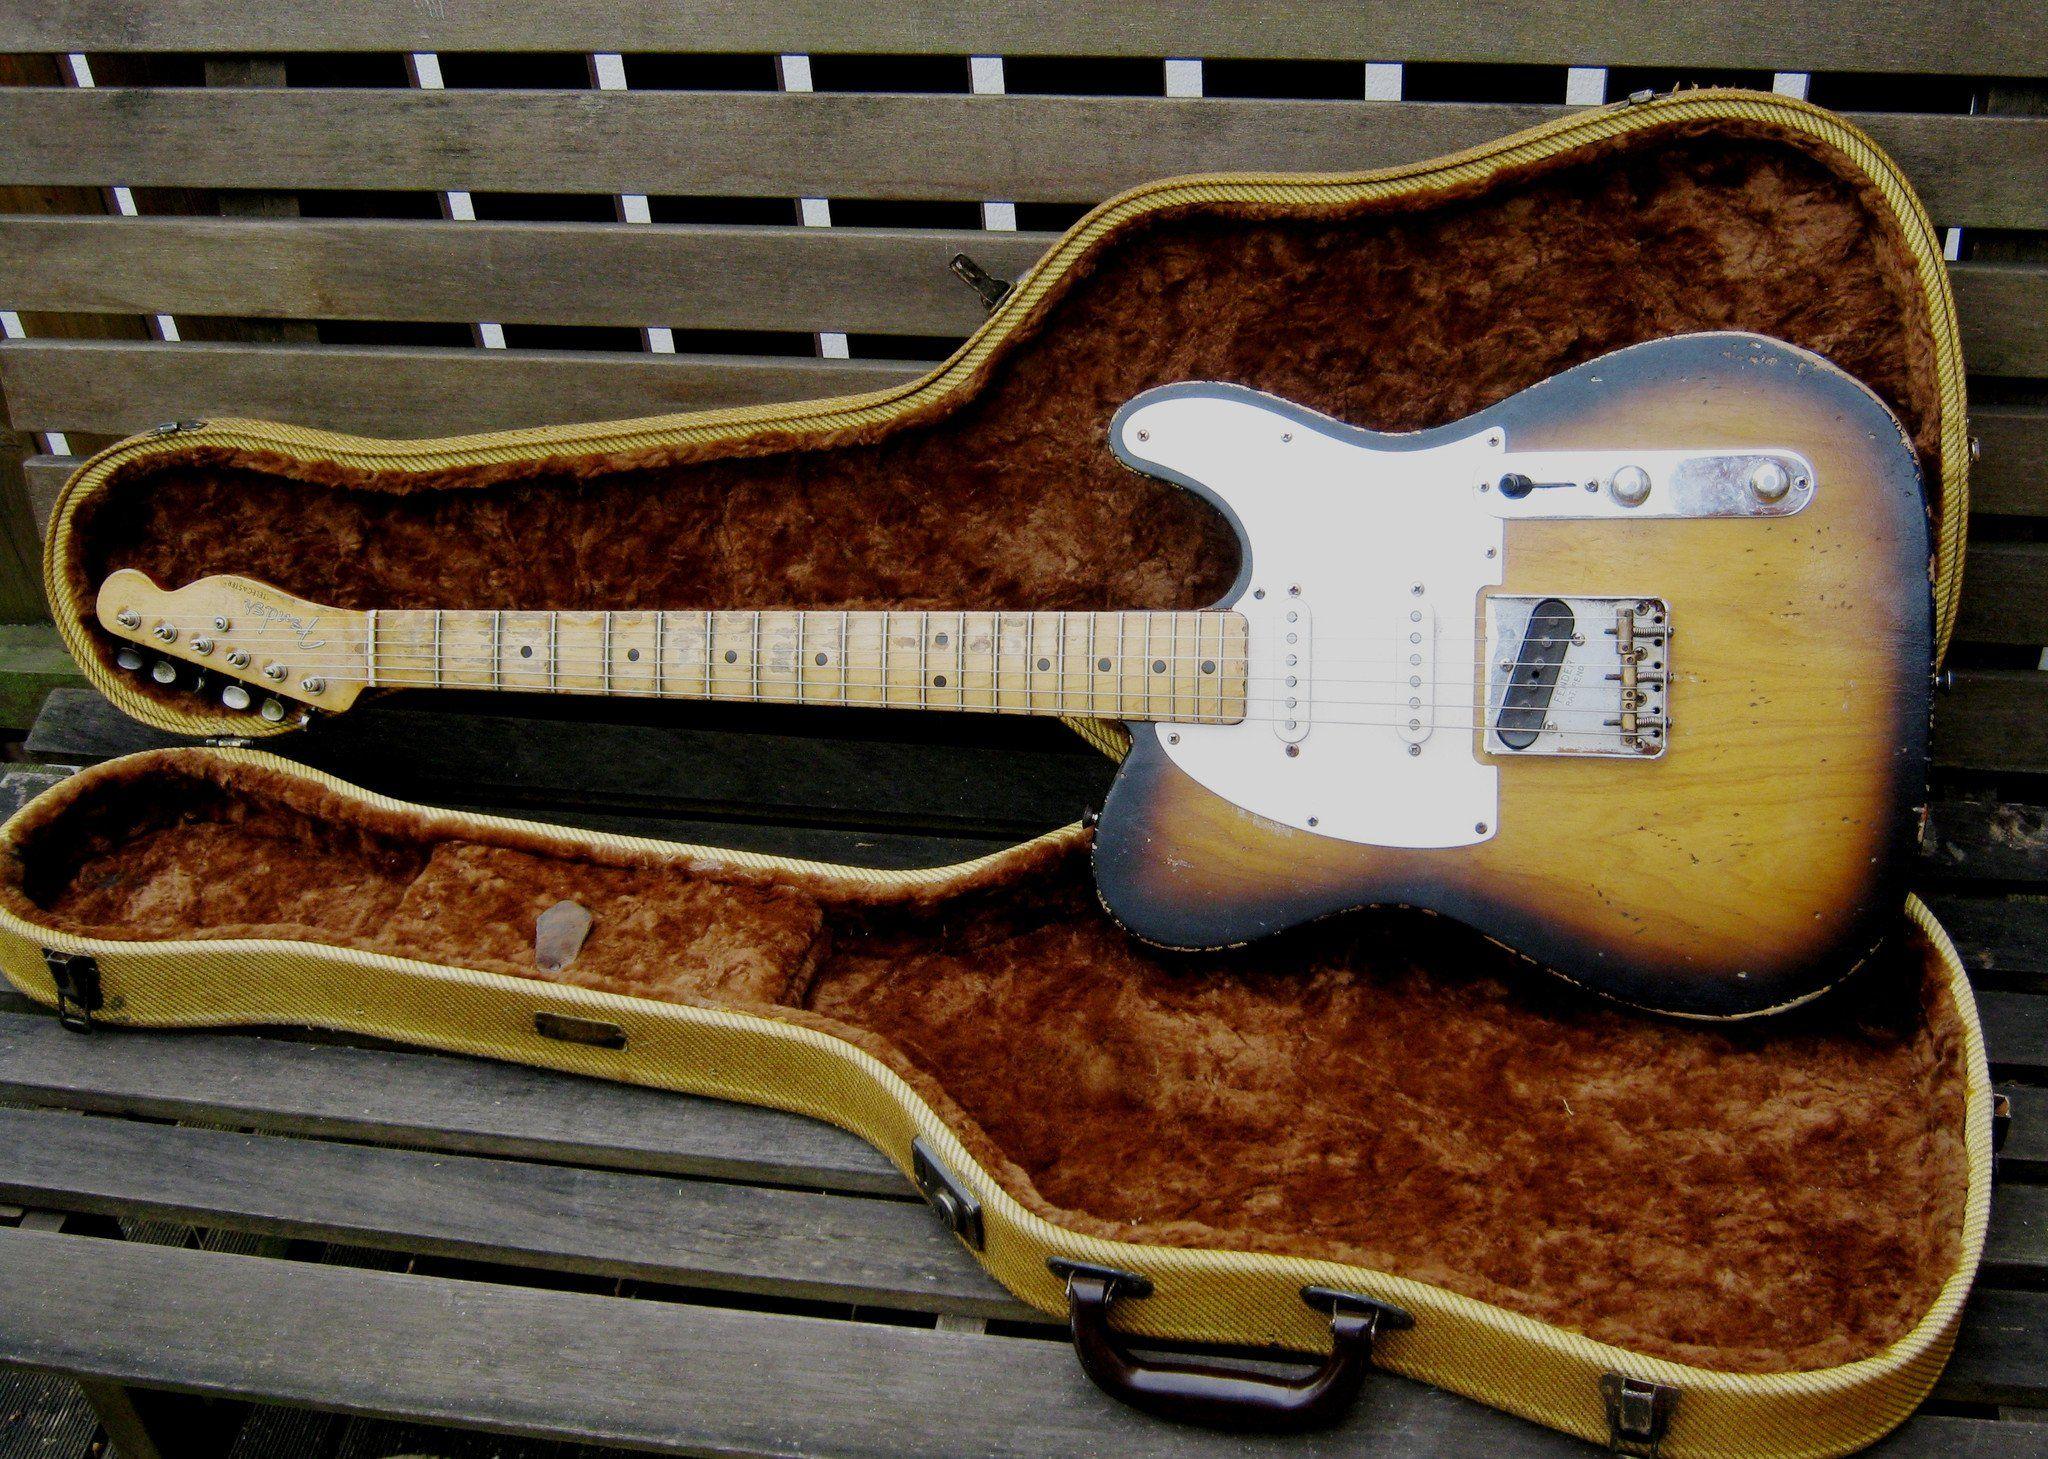 Vintage 1950 S Fender Guitar Case Reproductions Fender Guitar Case Vintage Guitars Cool Electric Guitars